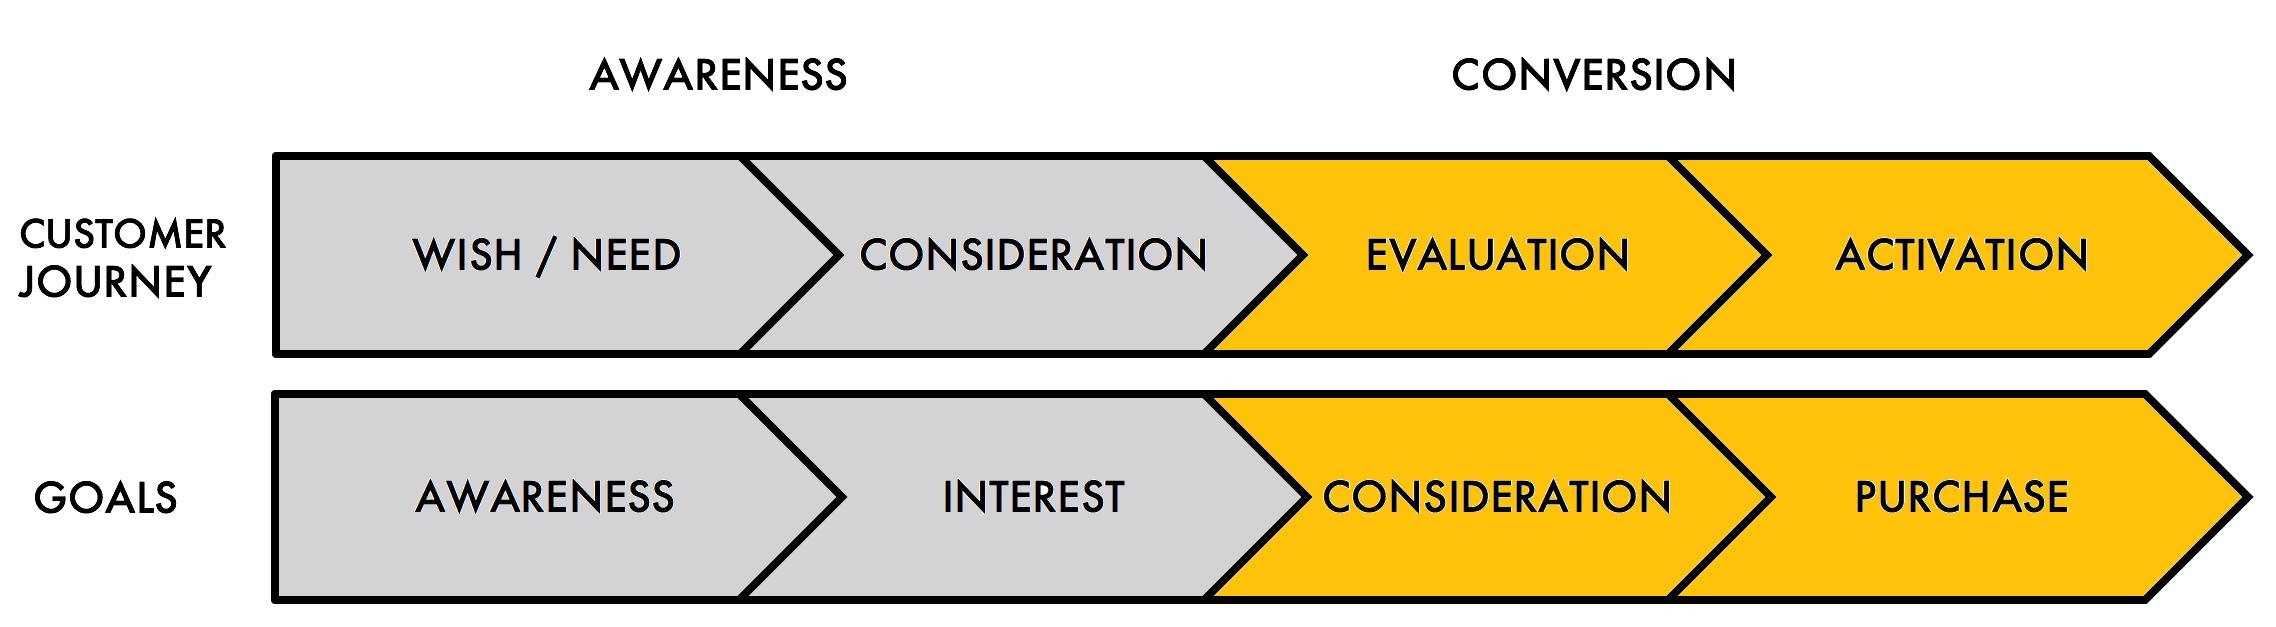 Brand Activation Model copy.png